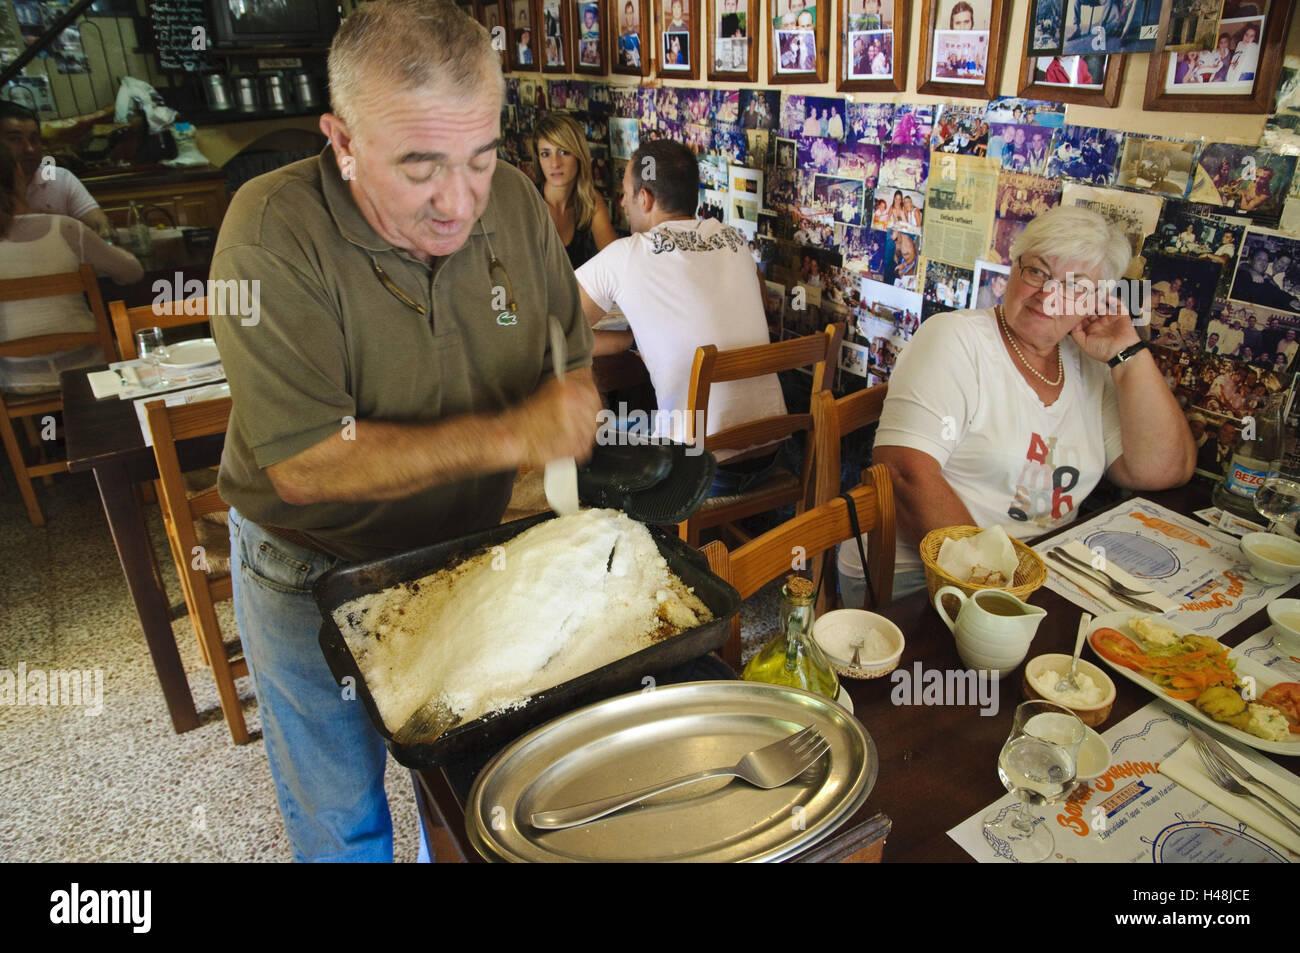 Restaurant 'Casa of Manolo', Manolo serves fish in salt crust, Ses Salines, Majorca, Spain, - Stock Image